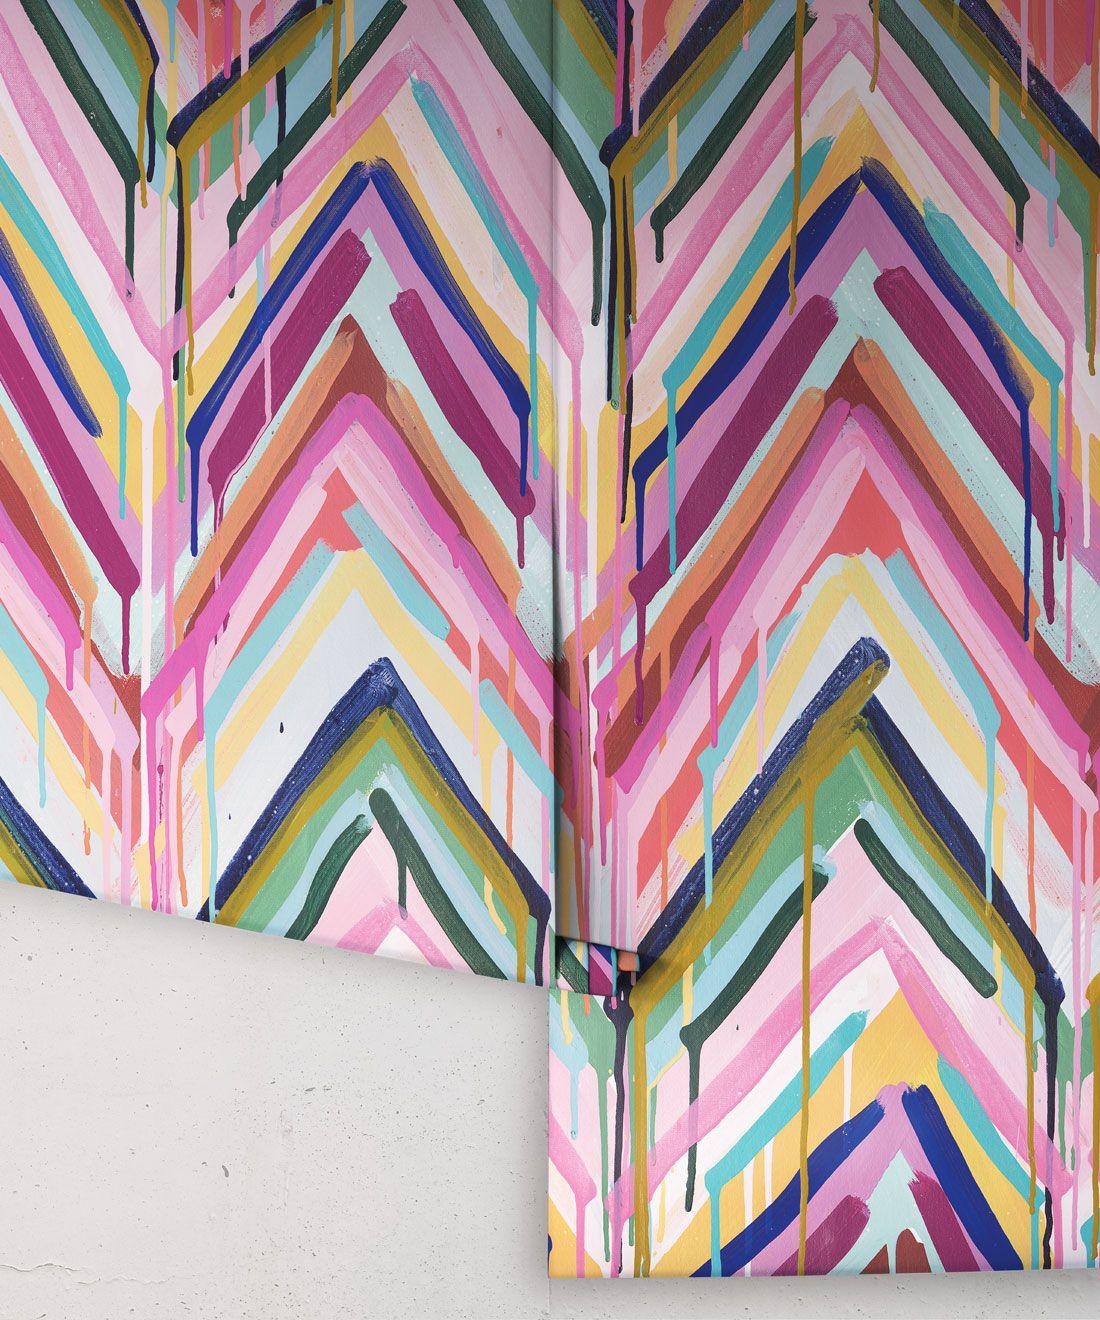 Crossroads Wallpaper •Colourful Painterly Wallpaper • Tiff Manuell • Chevron Wallpaper • Rolls